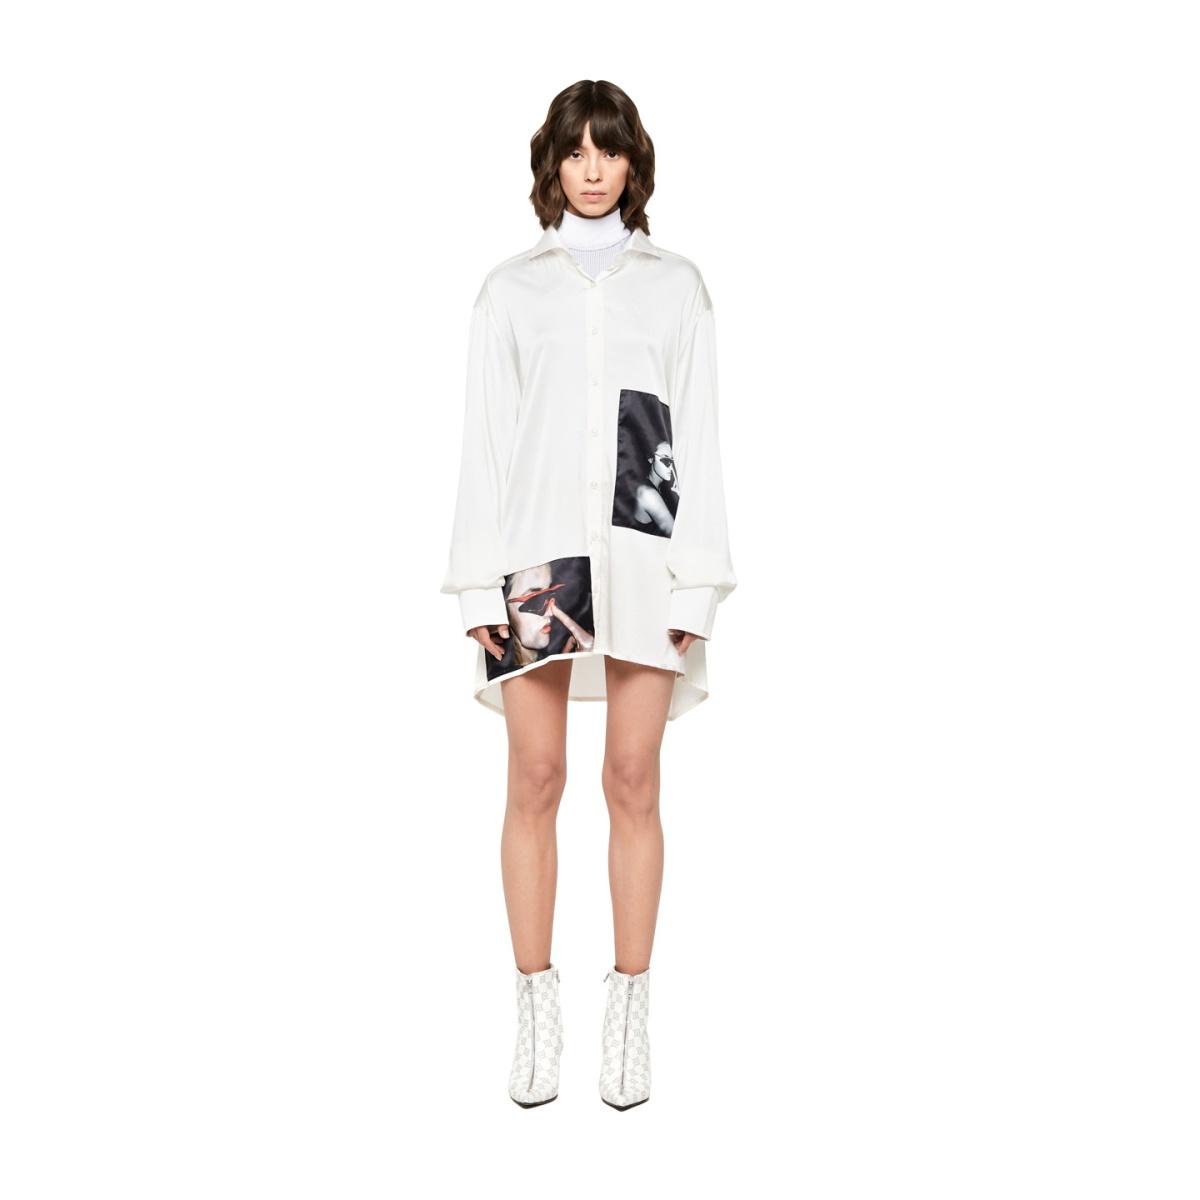 6YRS Oversize Shirt White